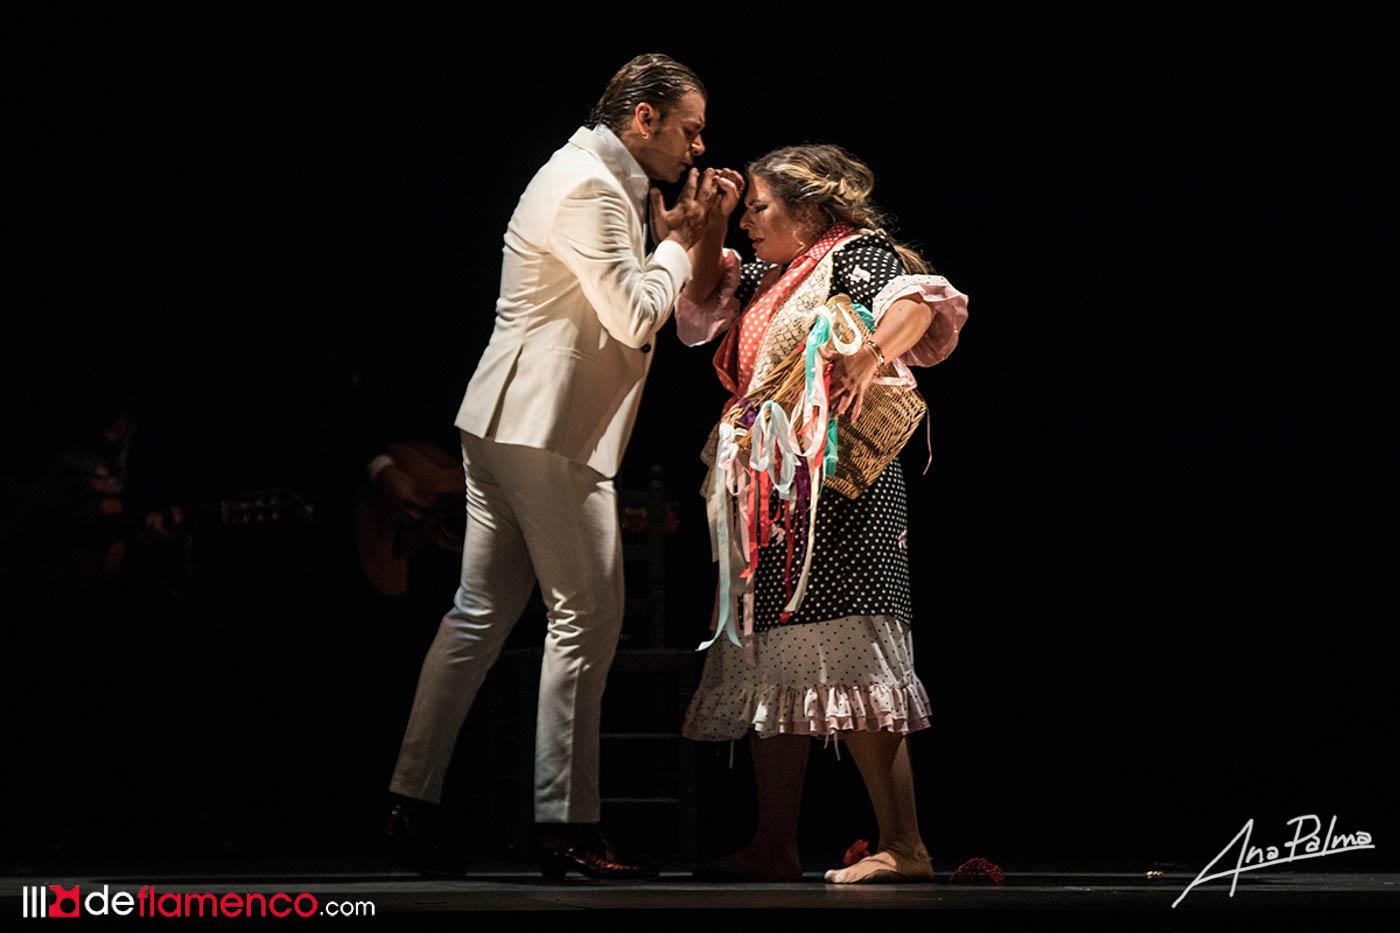 Fernando Jiménez & Pastora Galván 'Transiciones' - Festival de Jerez